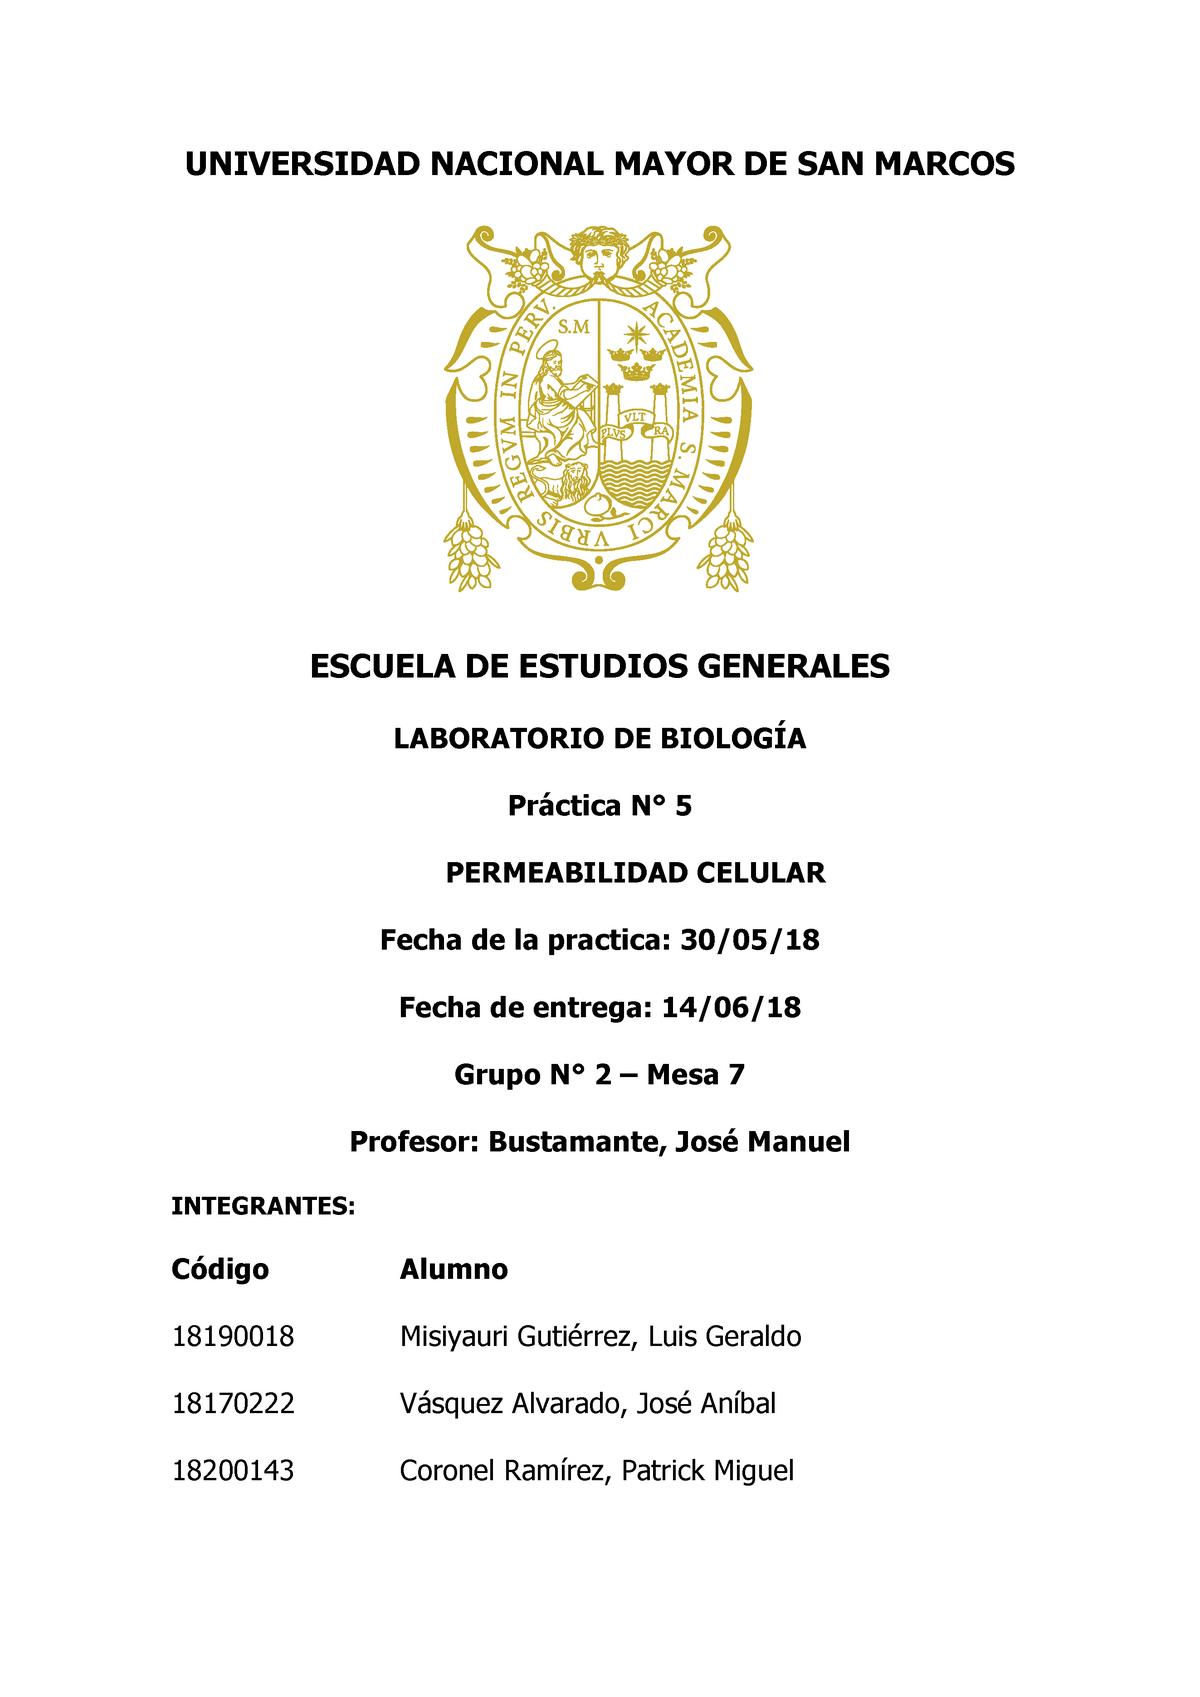 Informe Final 5 De Laboratorio De Biologia Permeabilidad